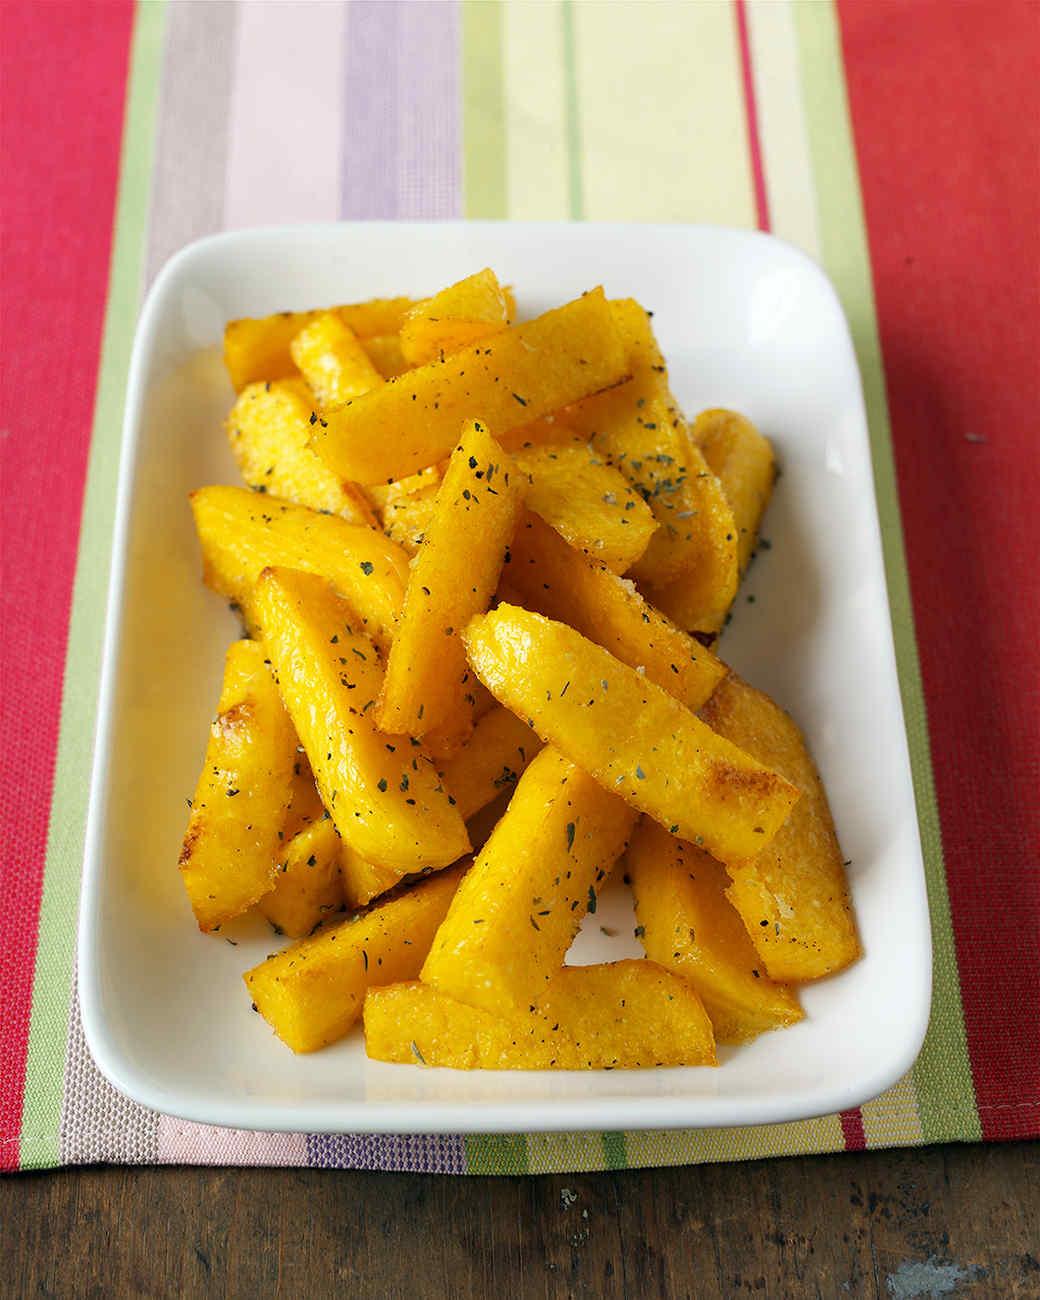 0406_edf_polenta_fries.jpg